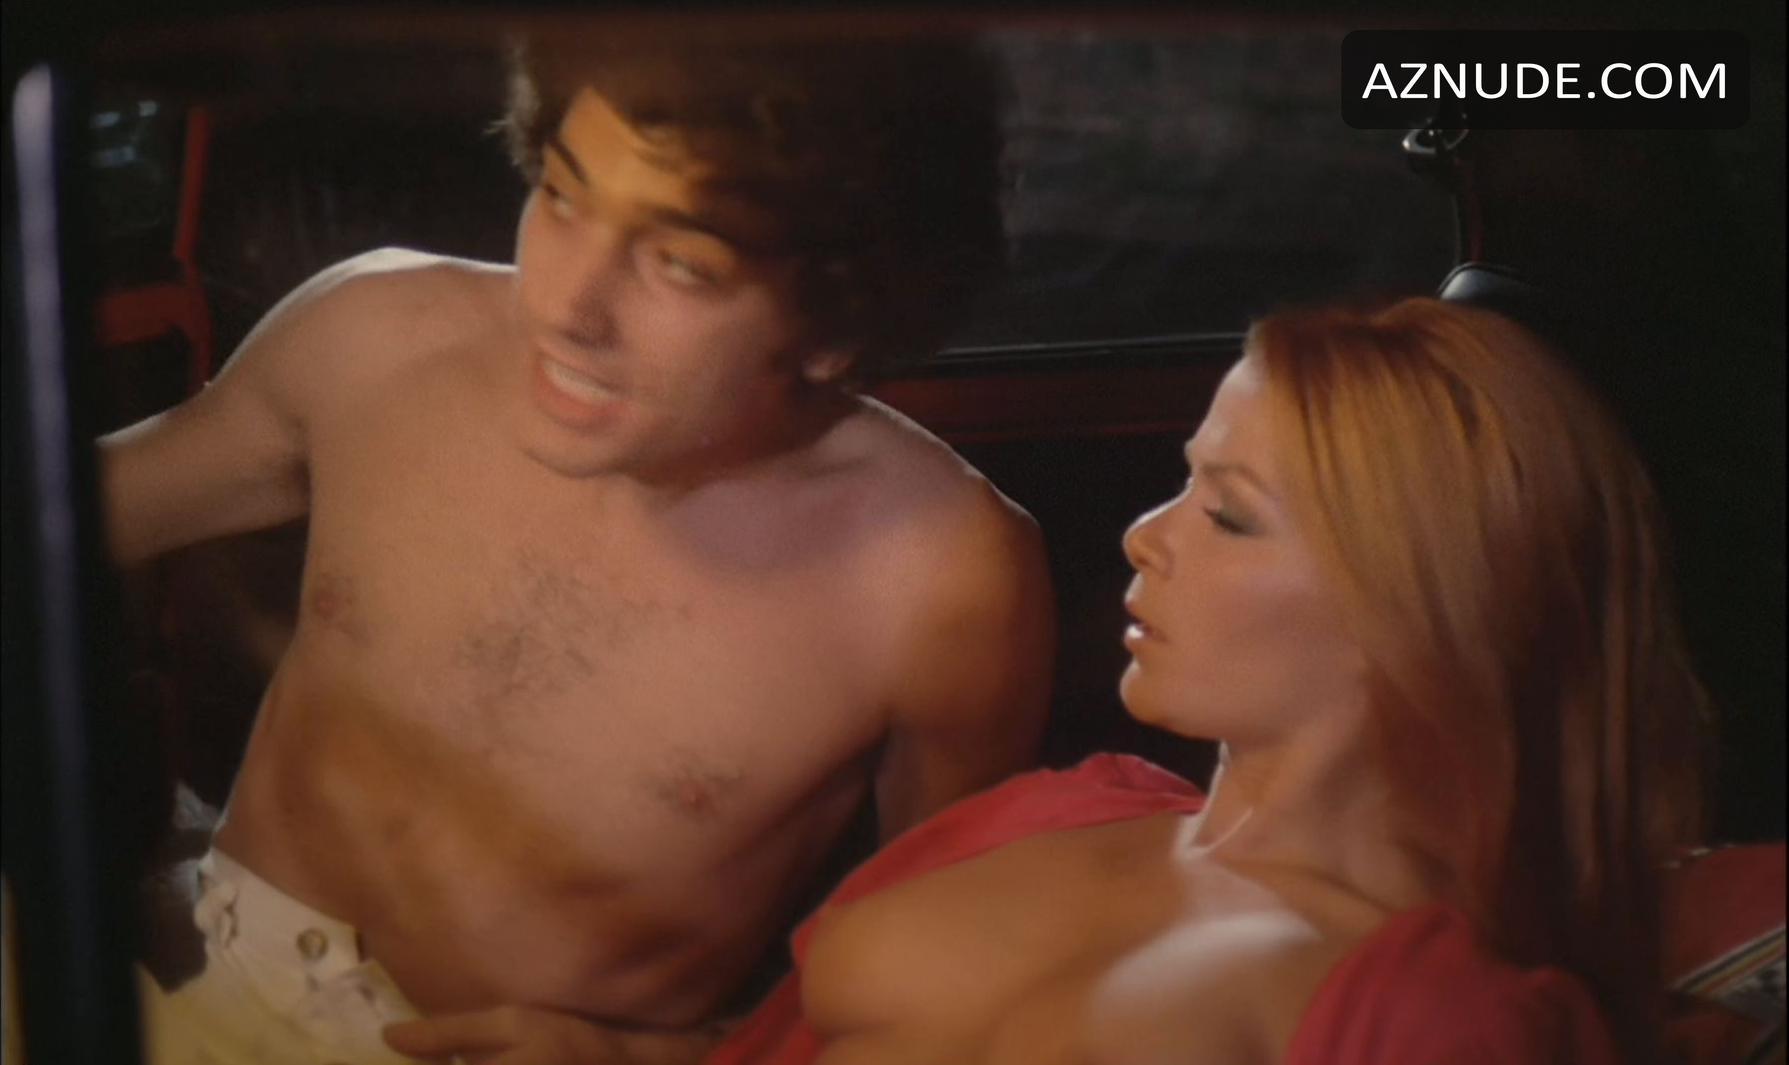 Angela Covello Nude patrizia adiutori nude - aznude